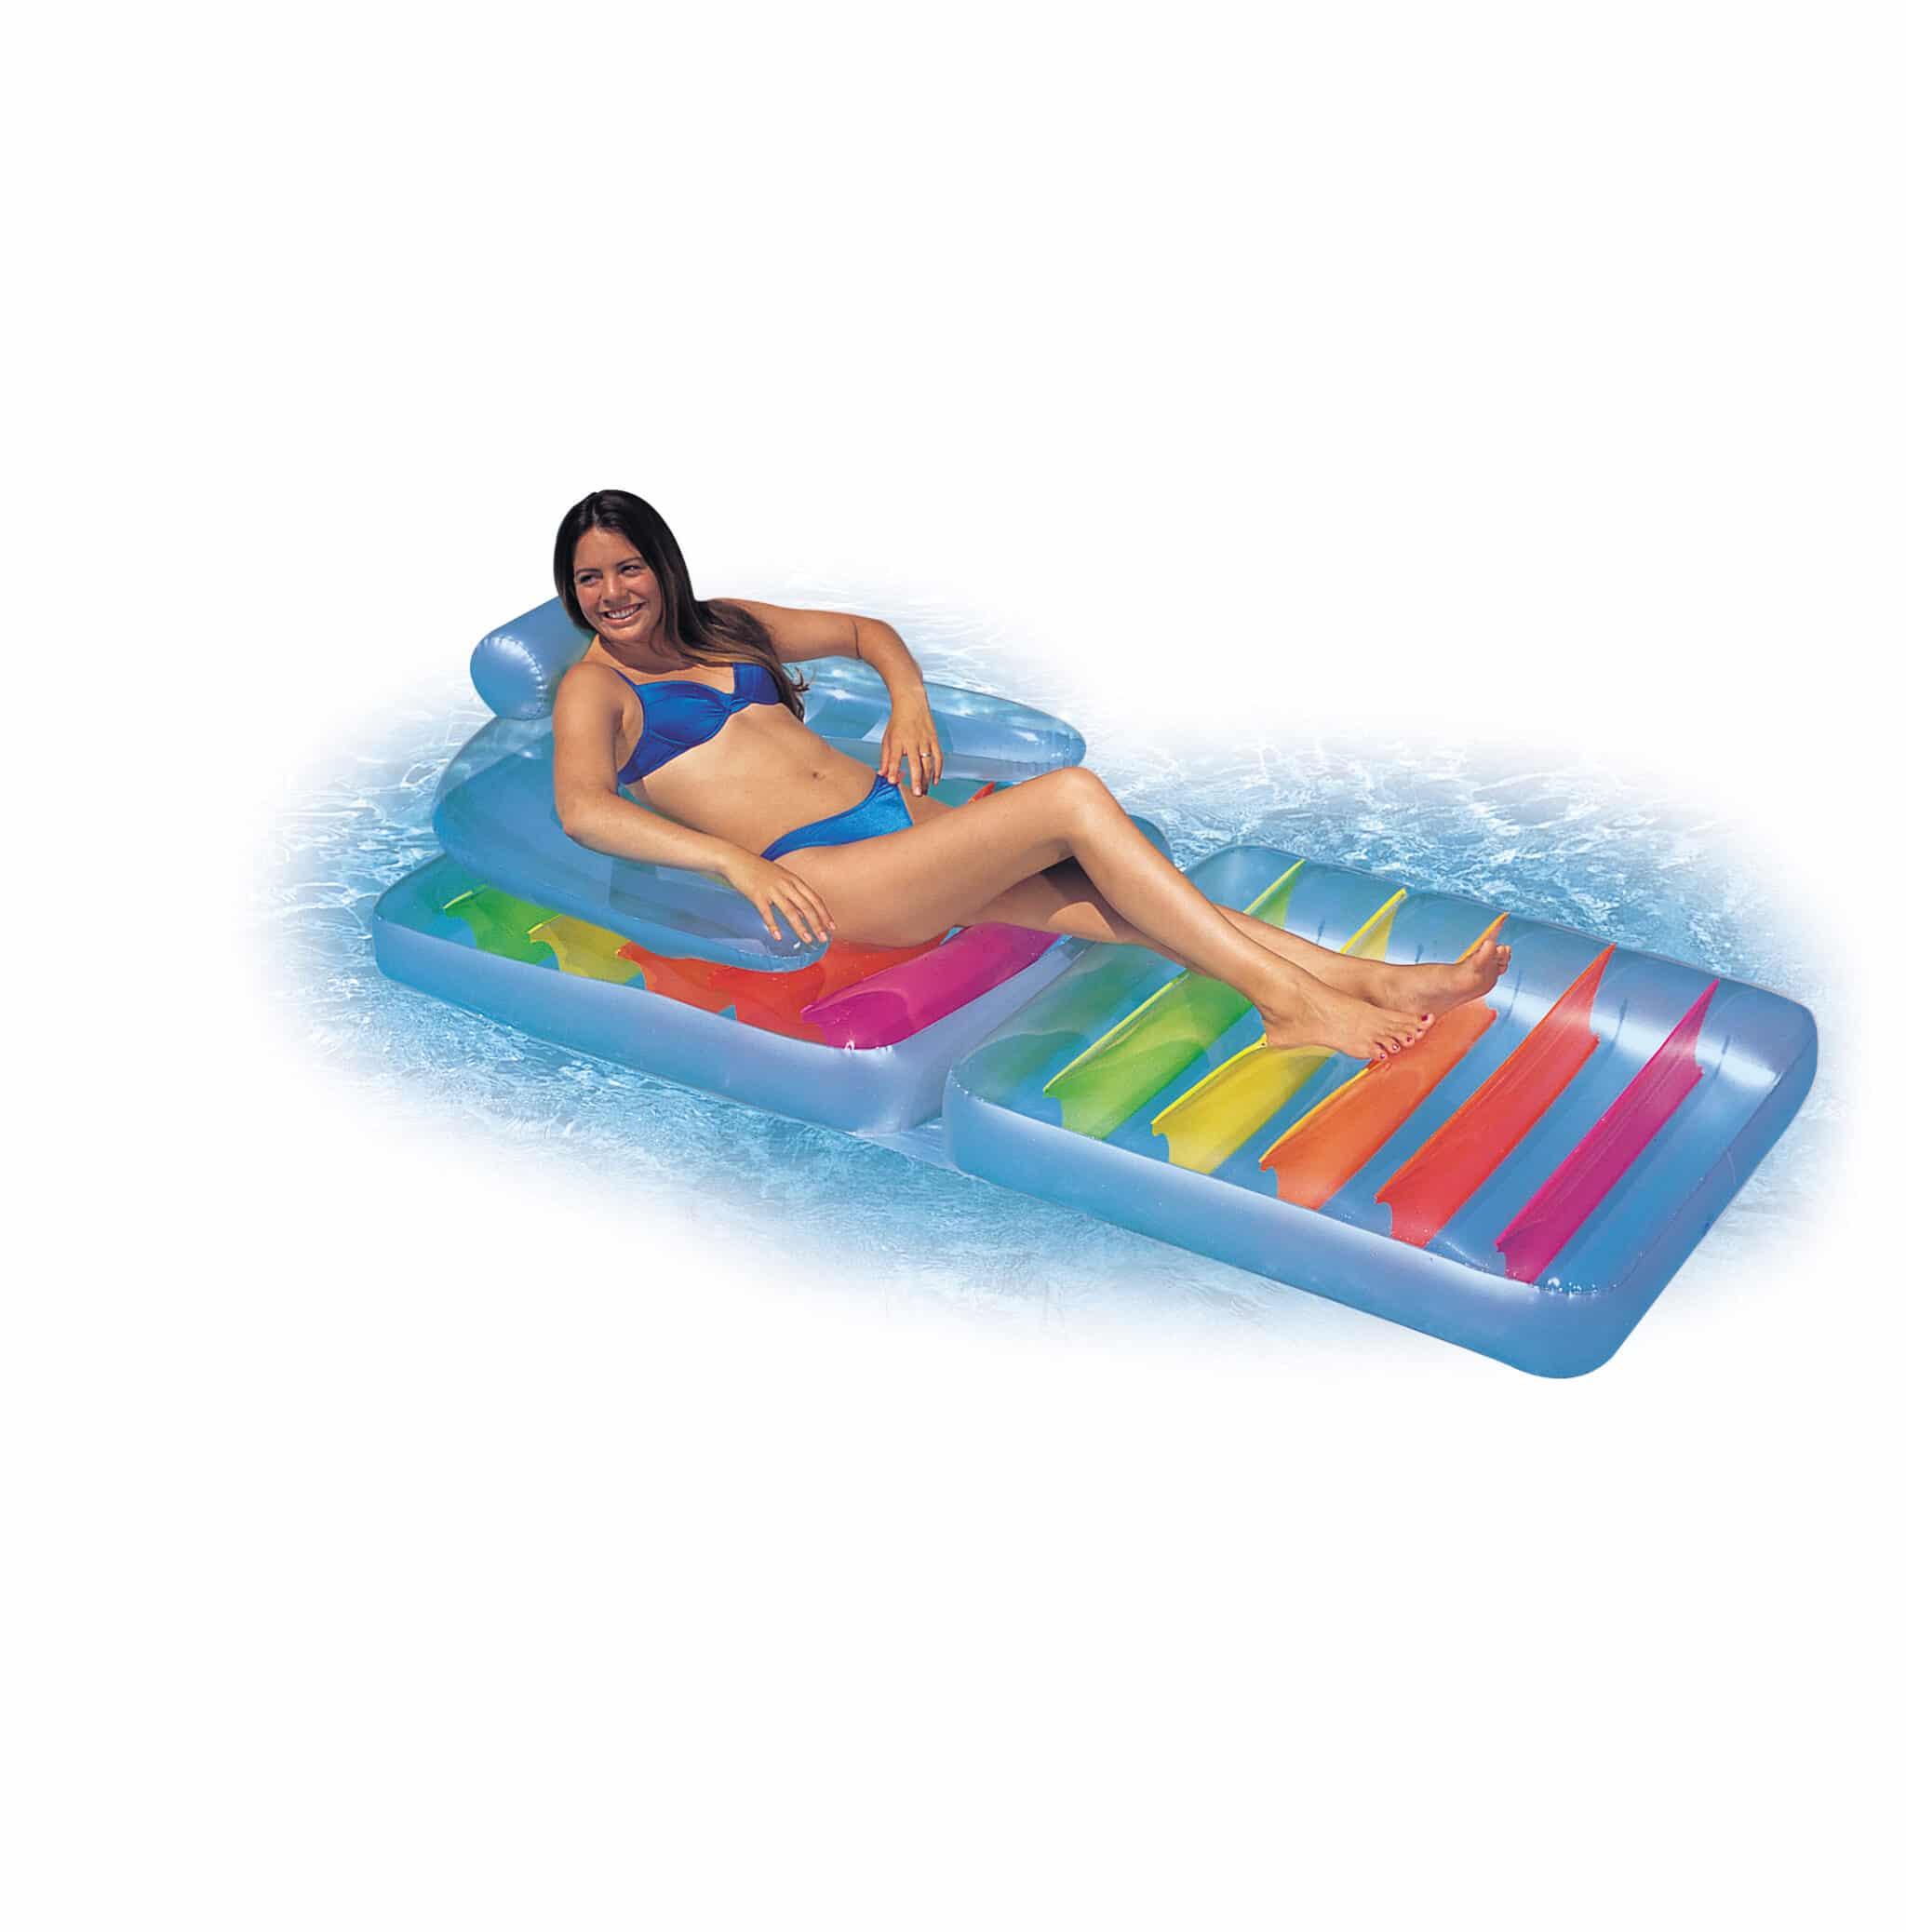 Intex pool Schwimmbad Matratze Lounge-Sitz/Liege